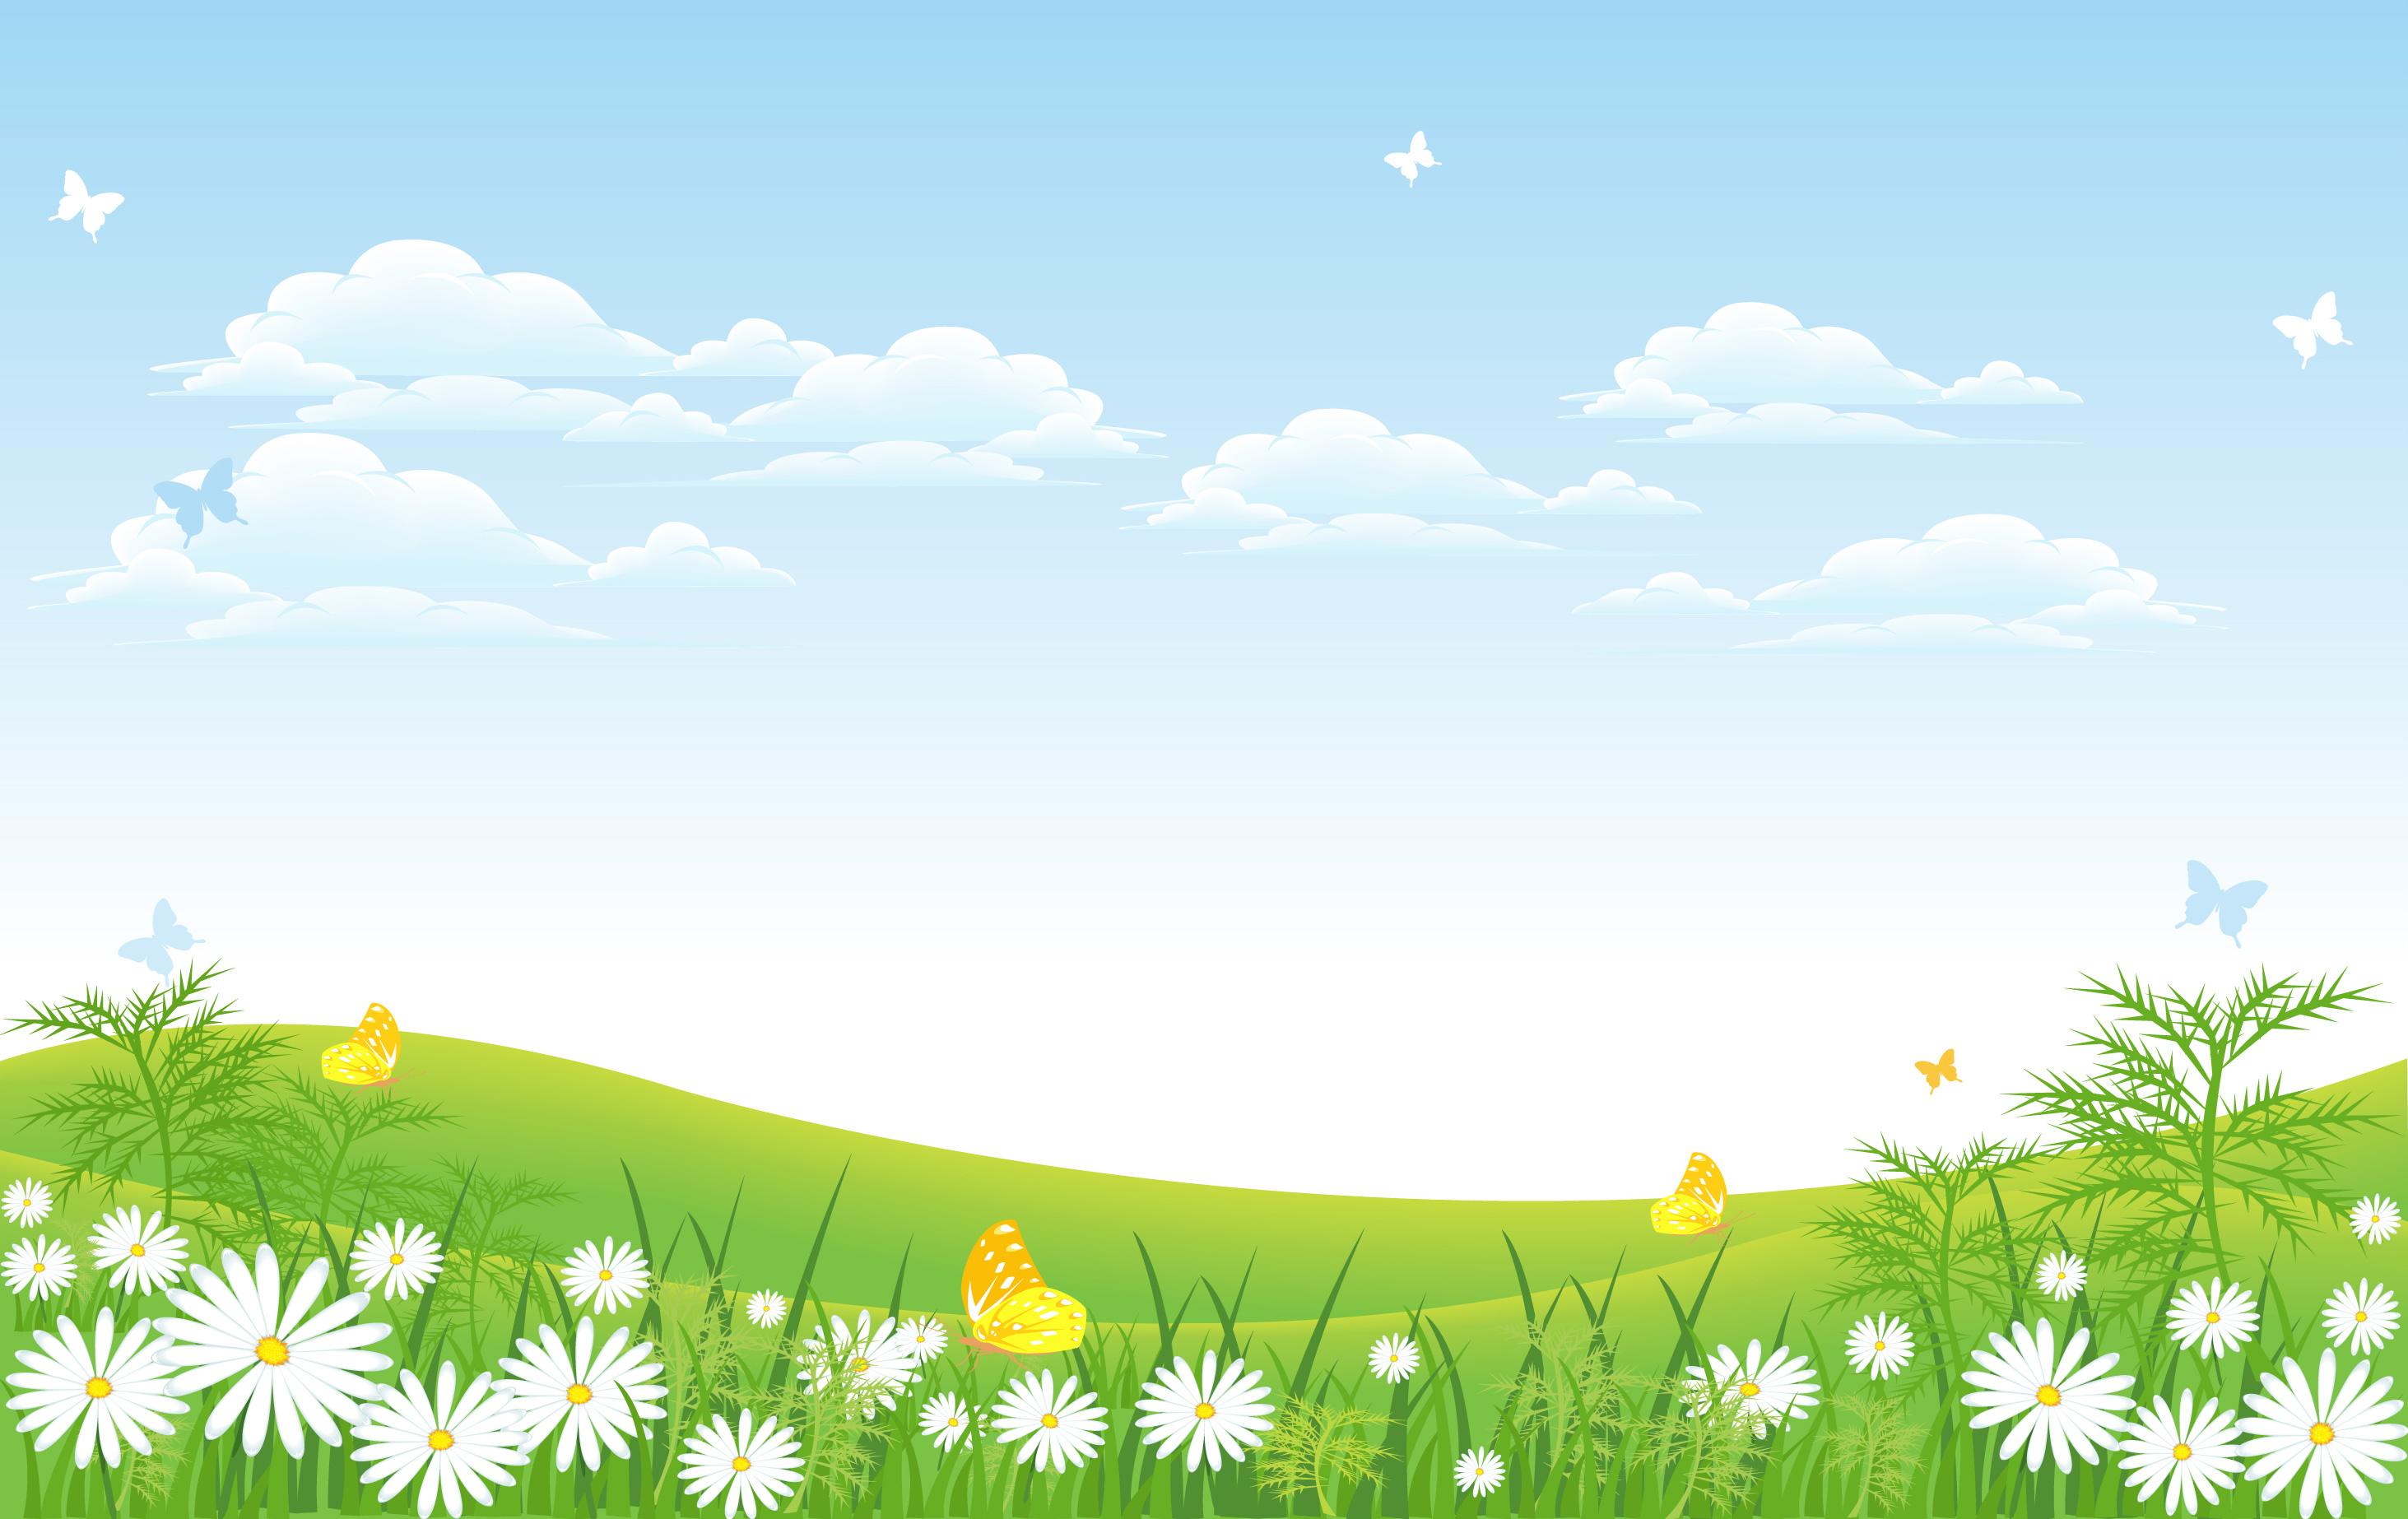 Летний фон картинки для детей